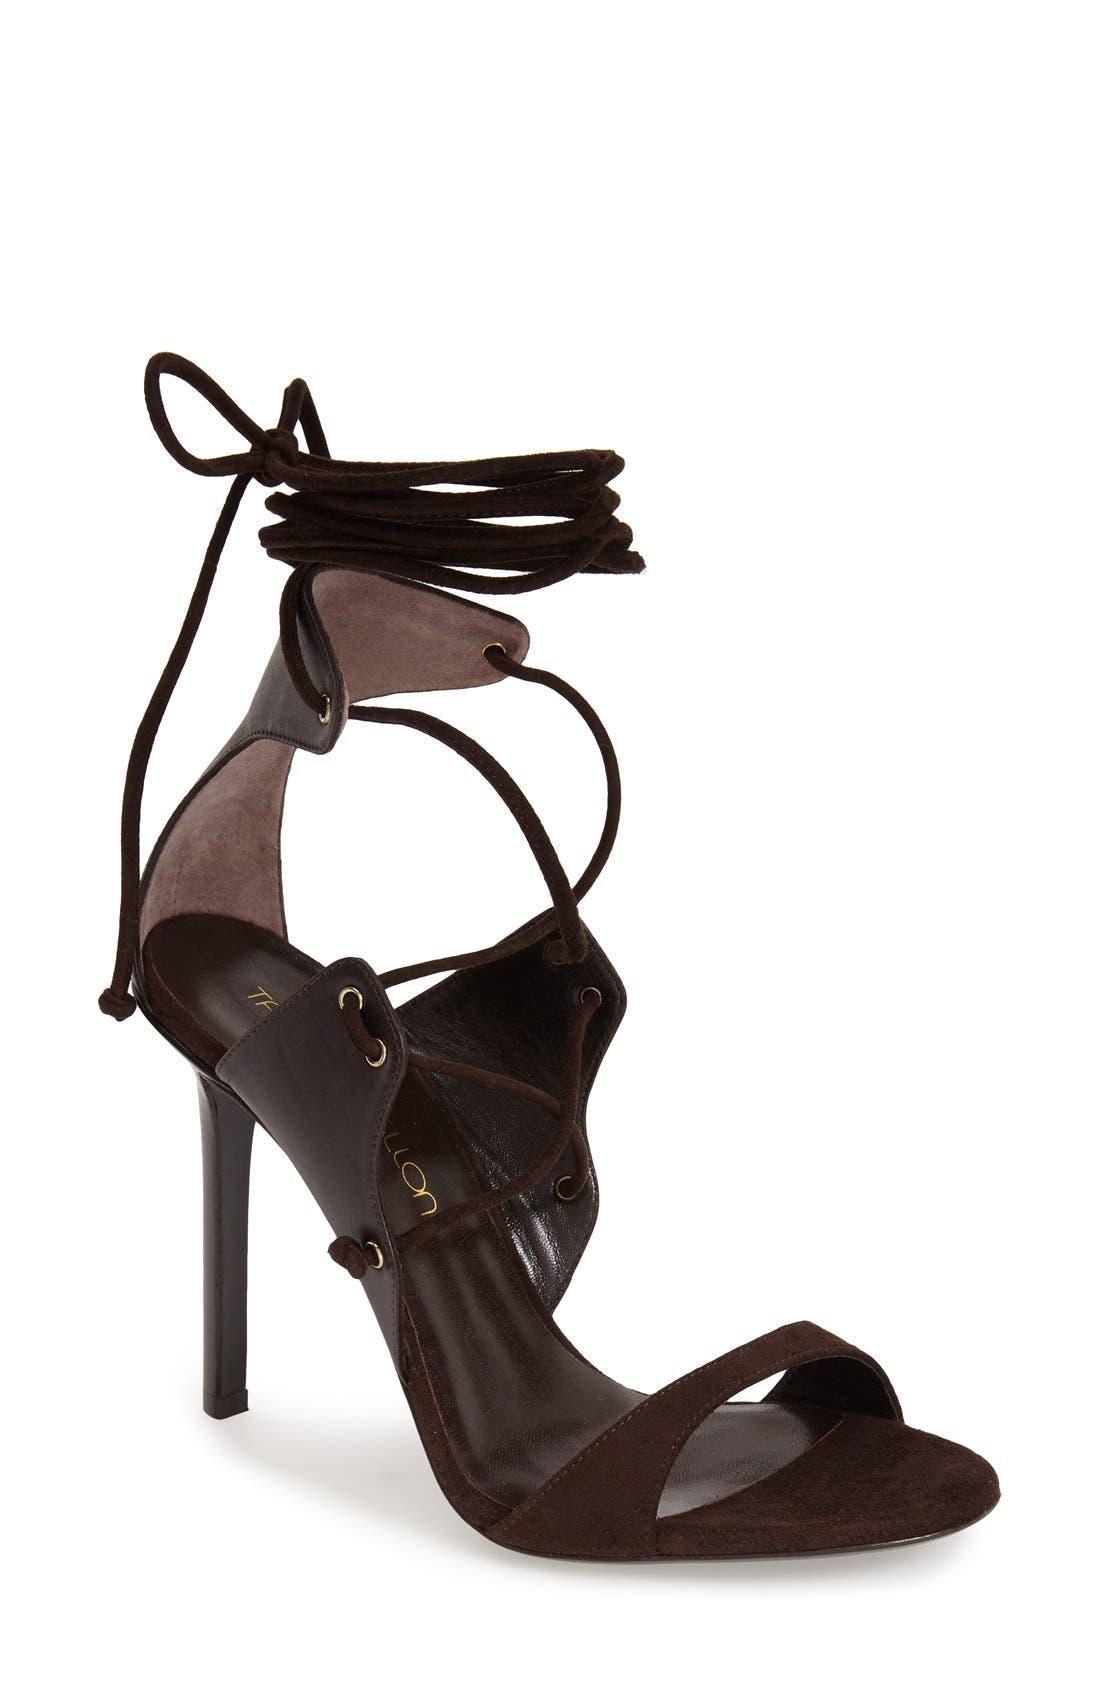 Alternate Image 1 Selected - Tamara Mellon 'Gladiatrix' Lace-Up Sandal (Women)